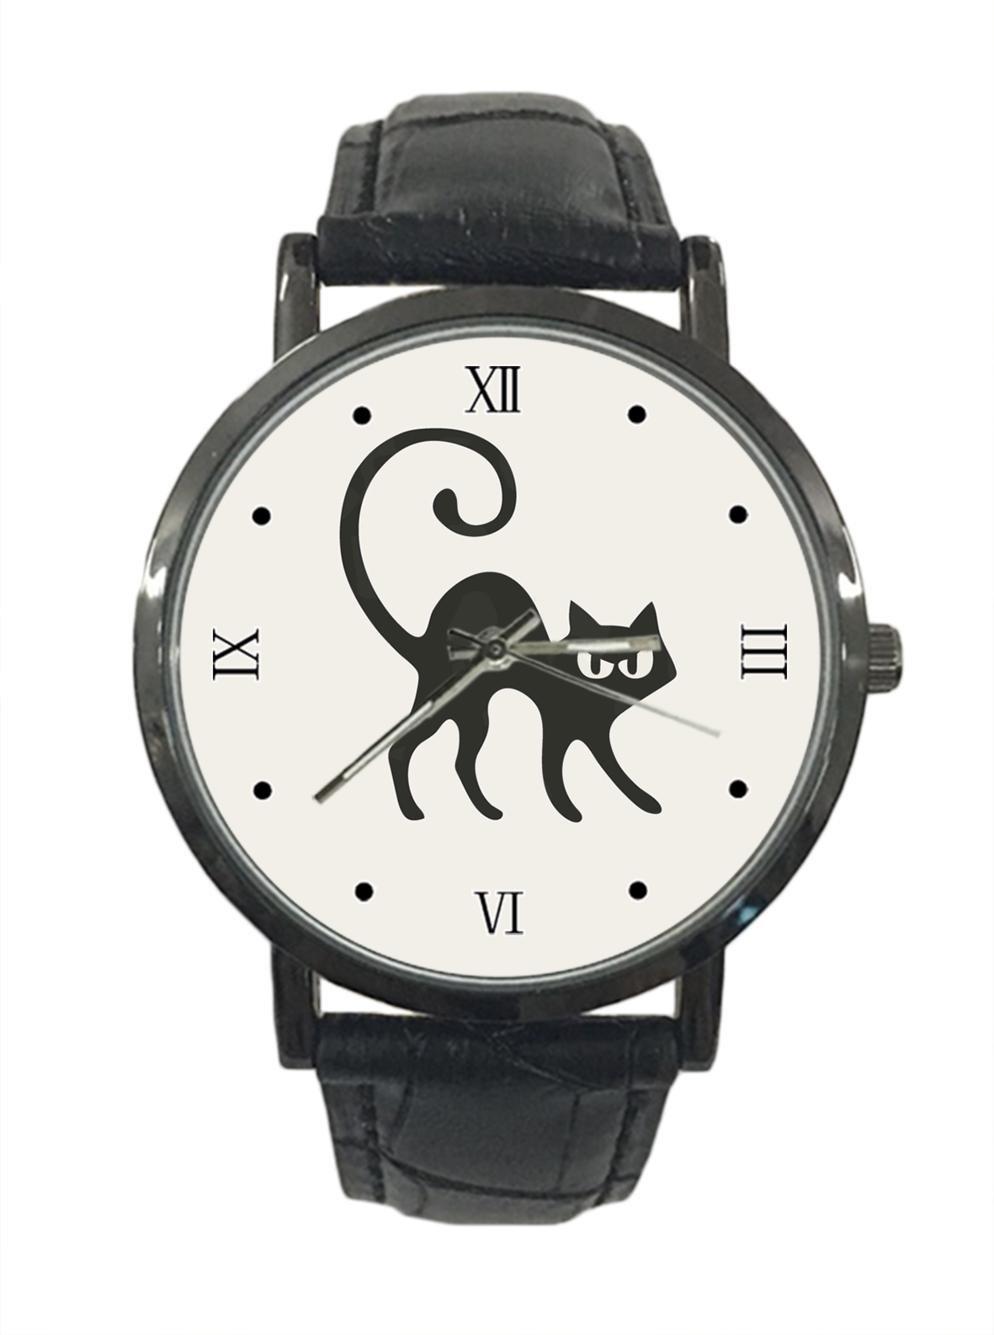 jkfgweeryhrt New Simple Fashion Halloween Cats Stainless Steel Leather Analog Quartz Sport Wrist Watch